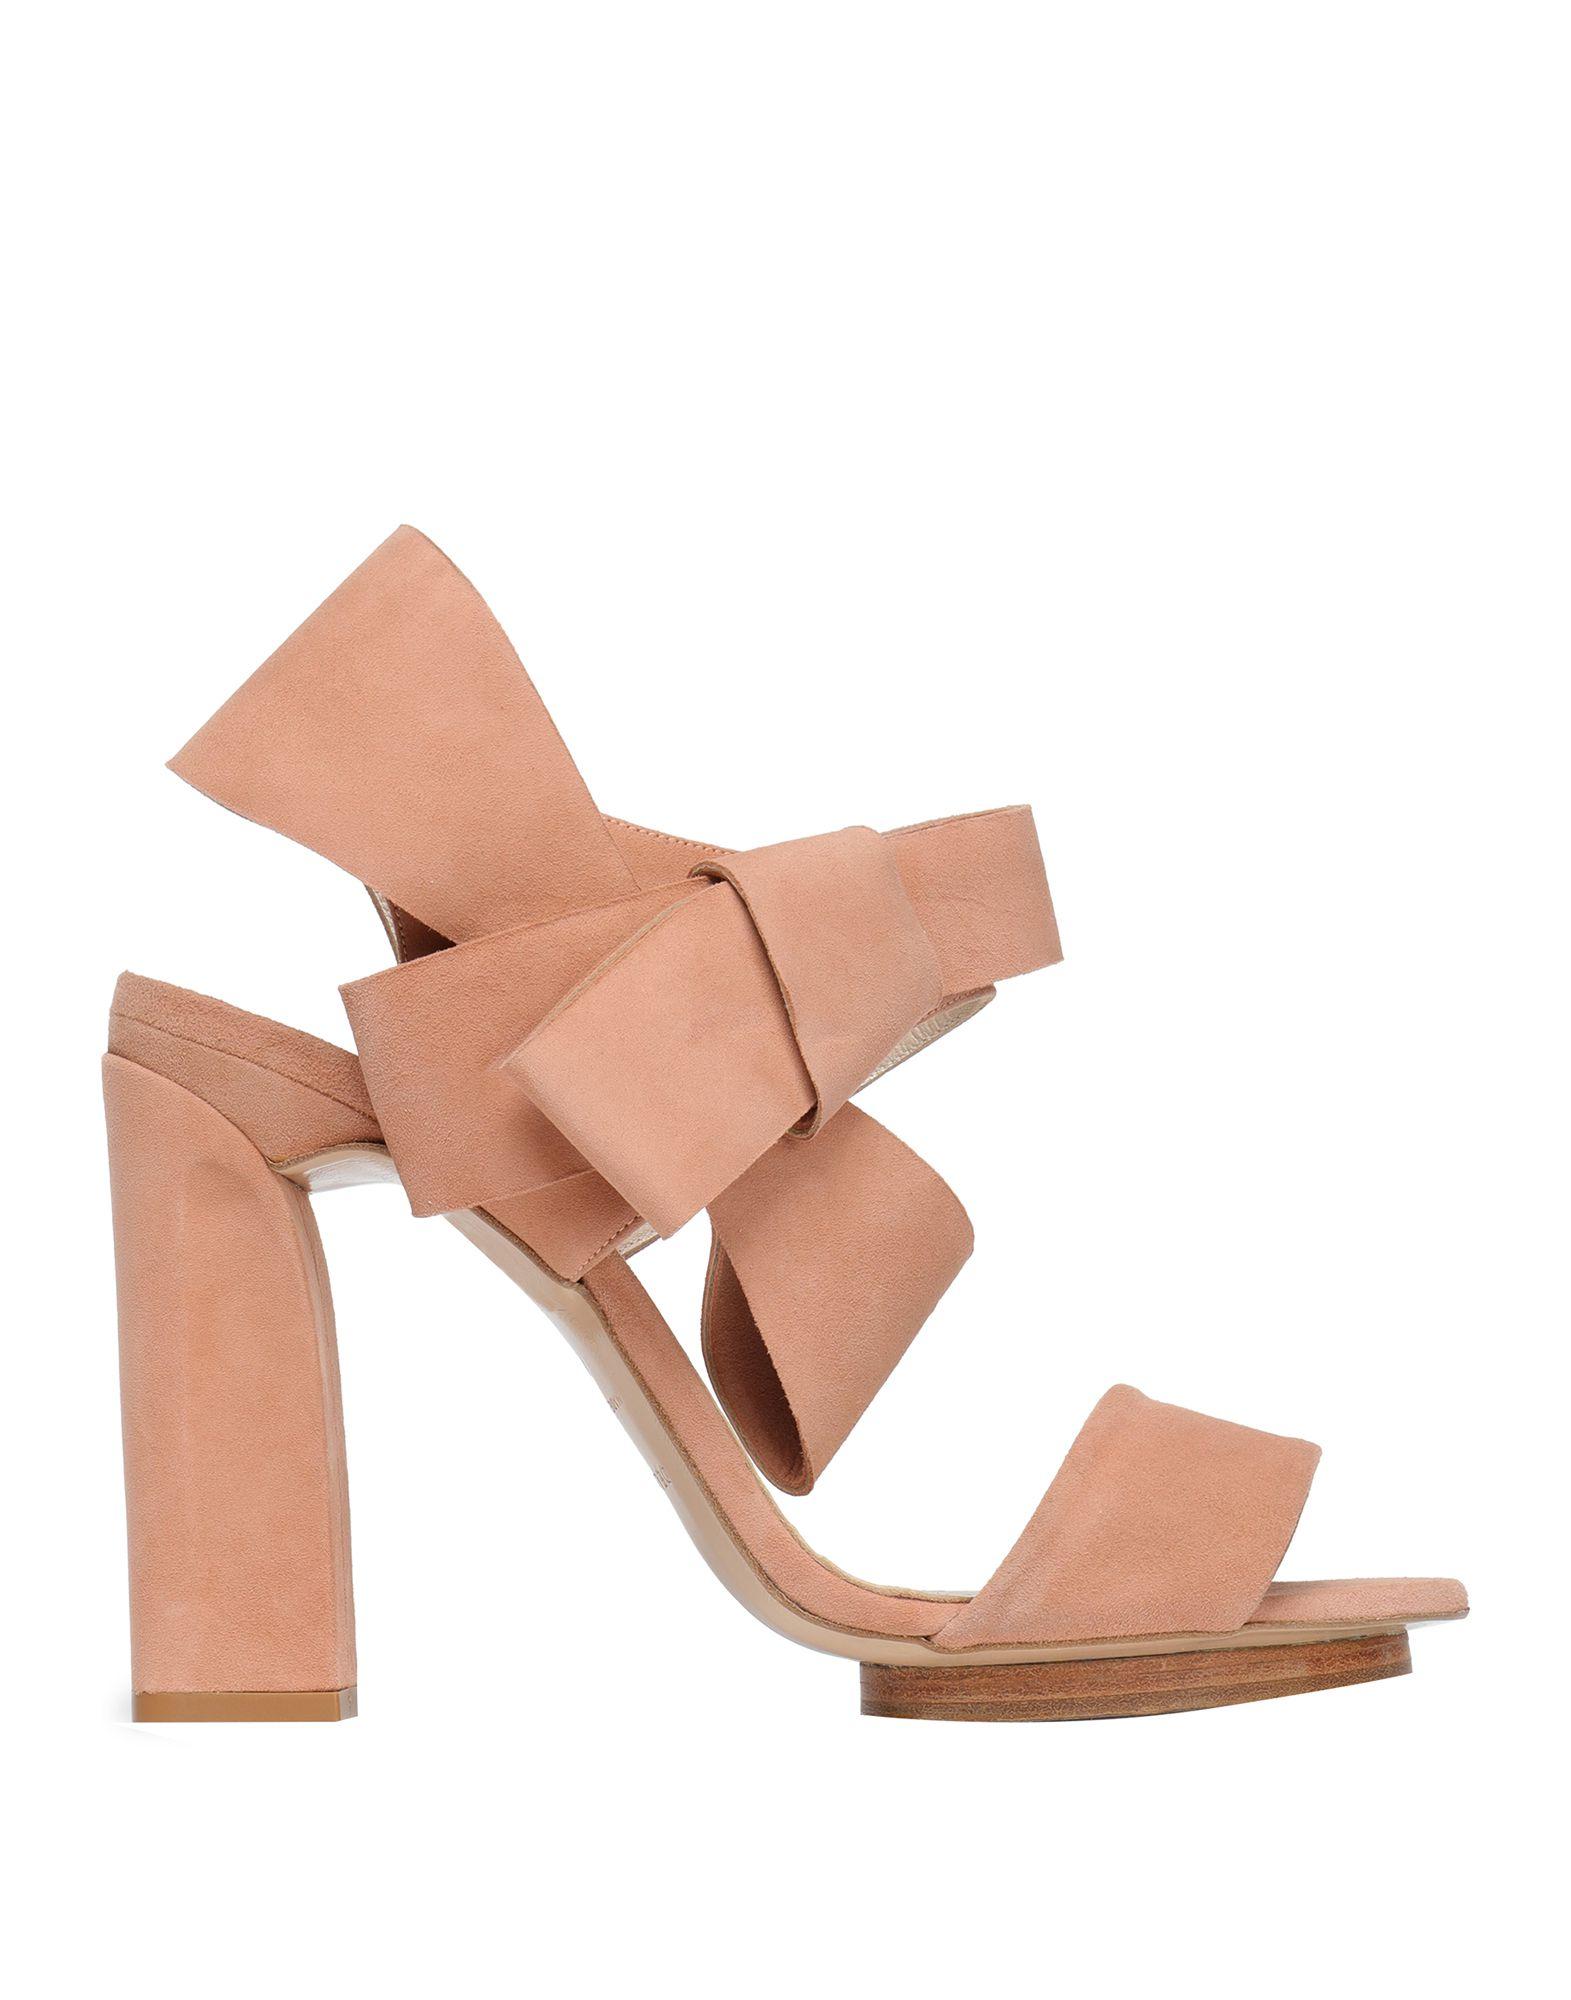 DELPOZO | DELPOZO Sandals 11697151 | Goxip